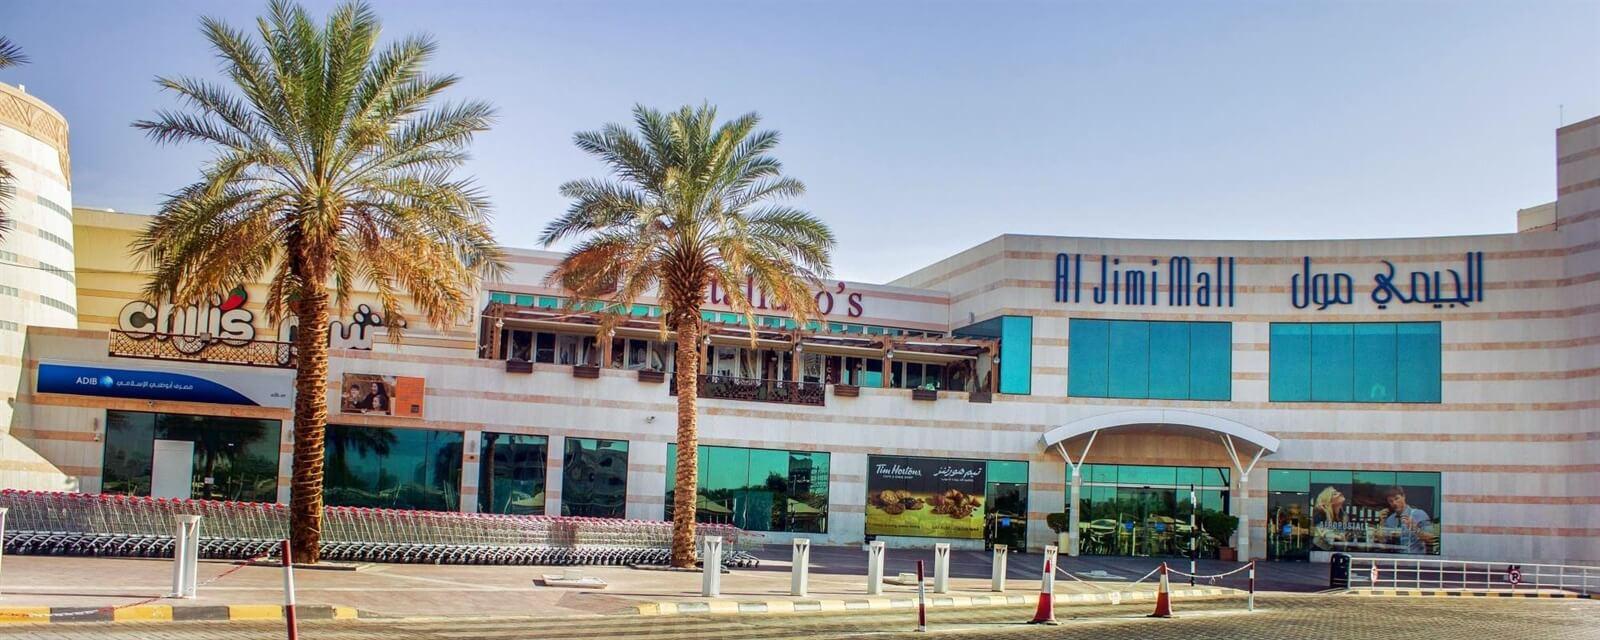 Locations & Opening Hours - Al Jimi Mall | Magic Planet UAE